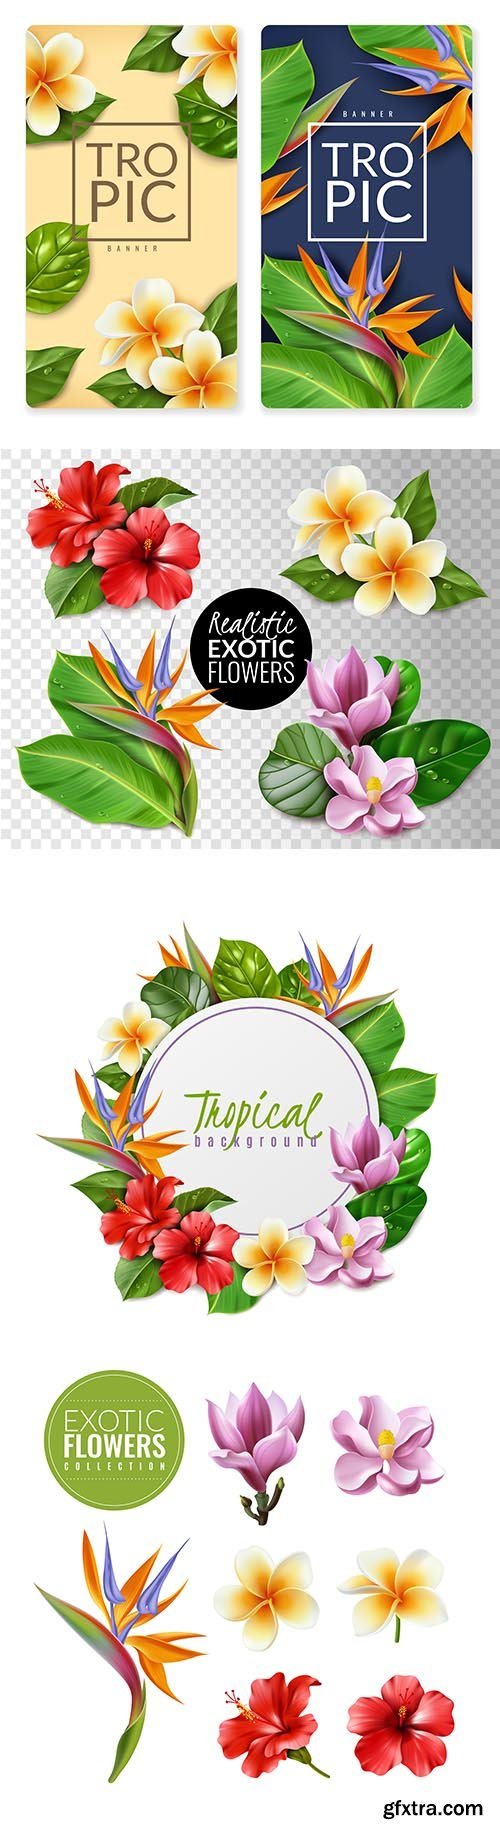 Realistic Exotic Flowers Illustration